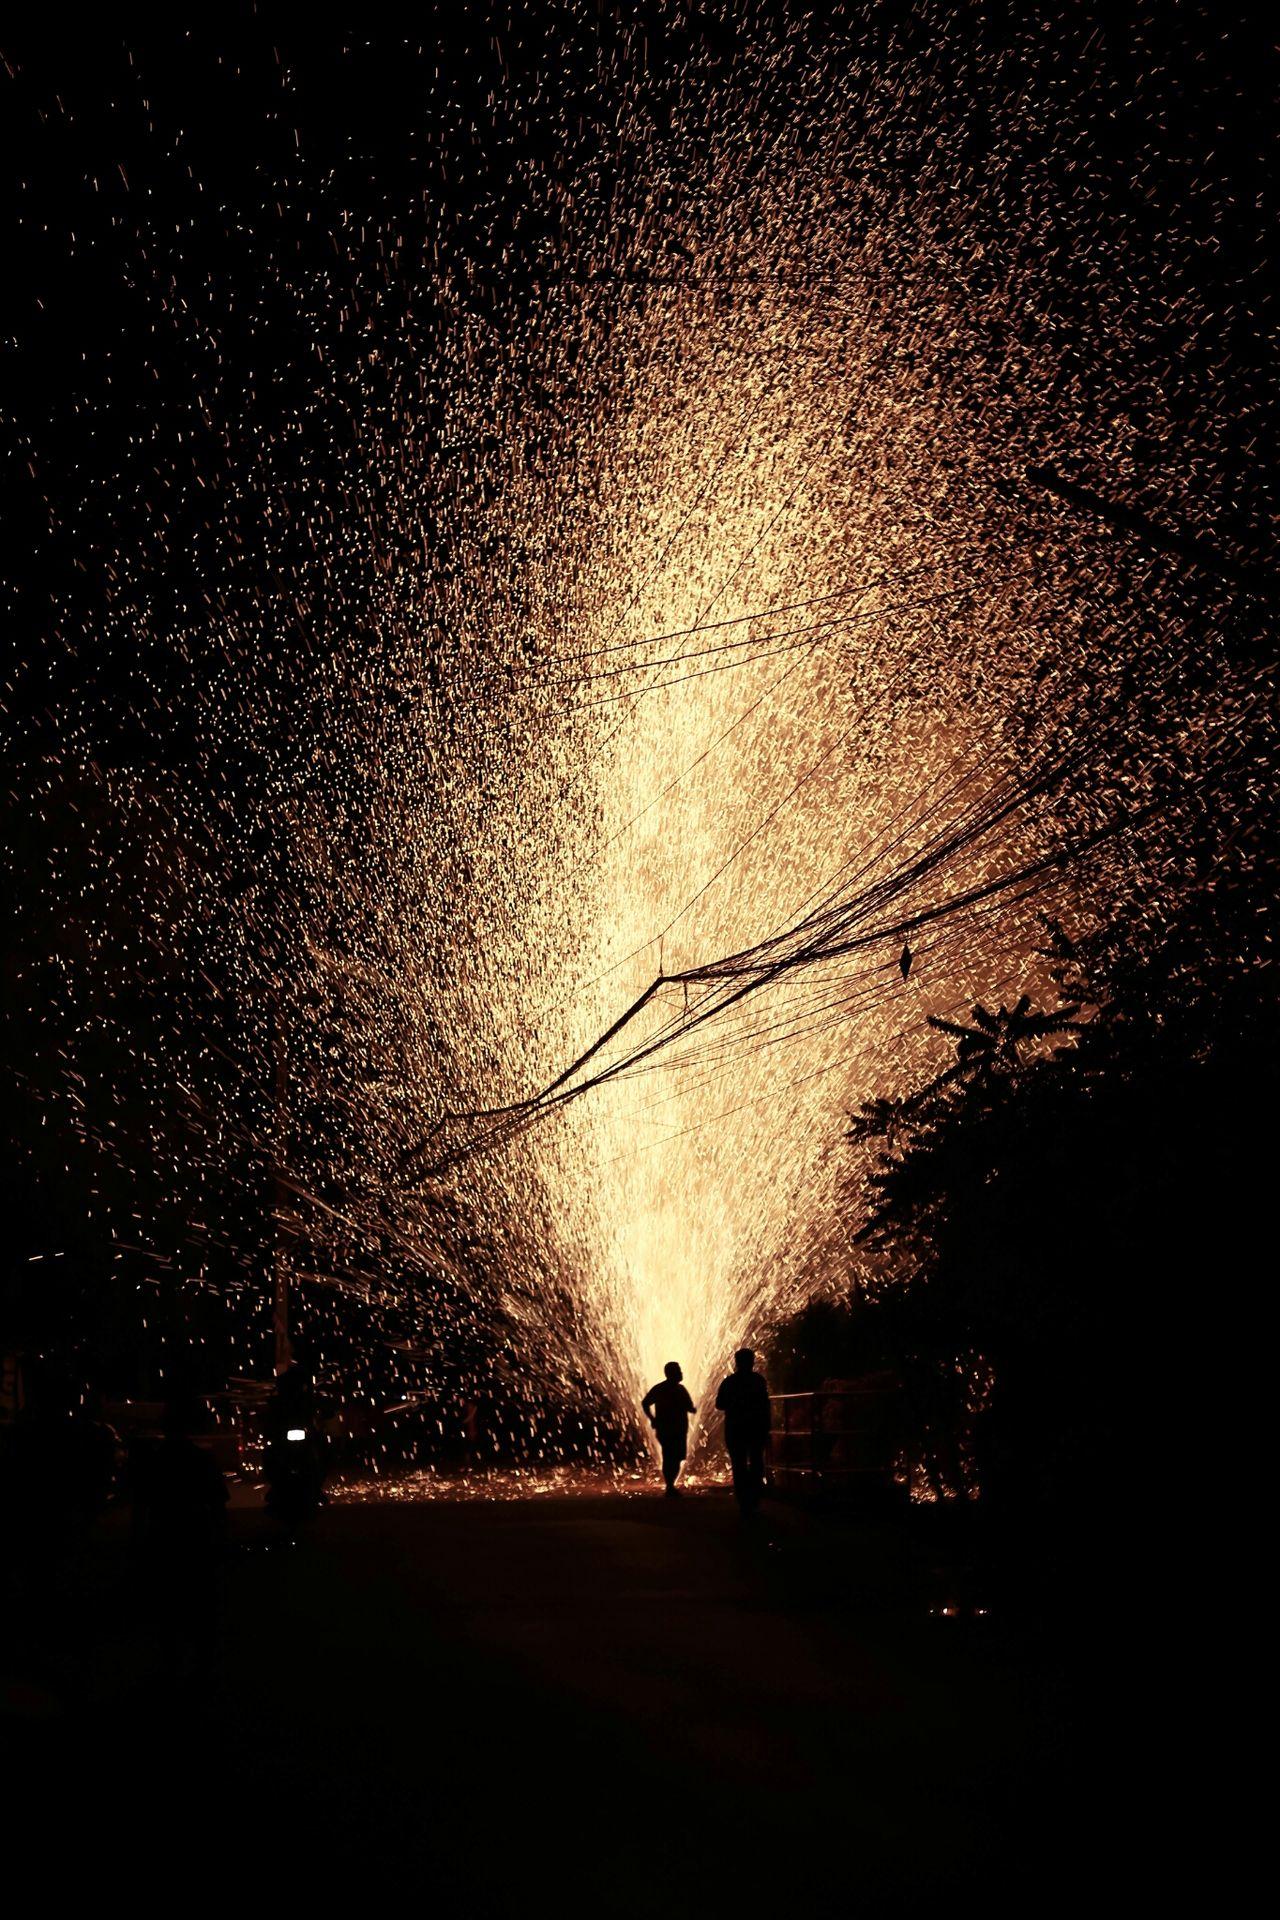 Fireworks Loy Krathong Fireworks EyeEmbestshots Festival